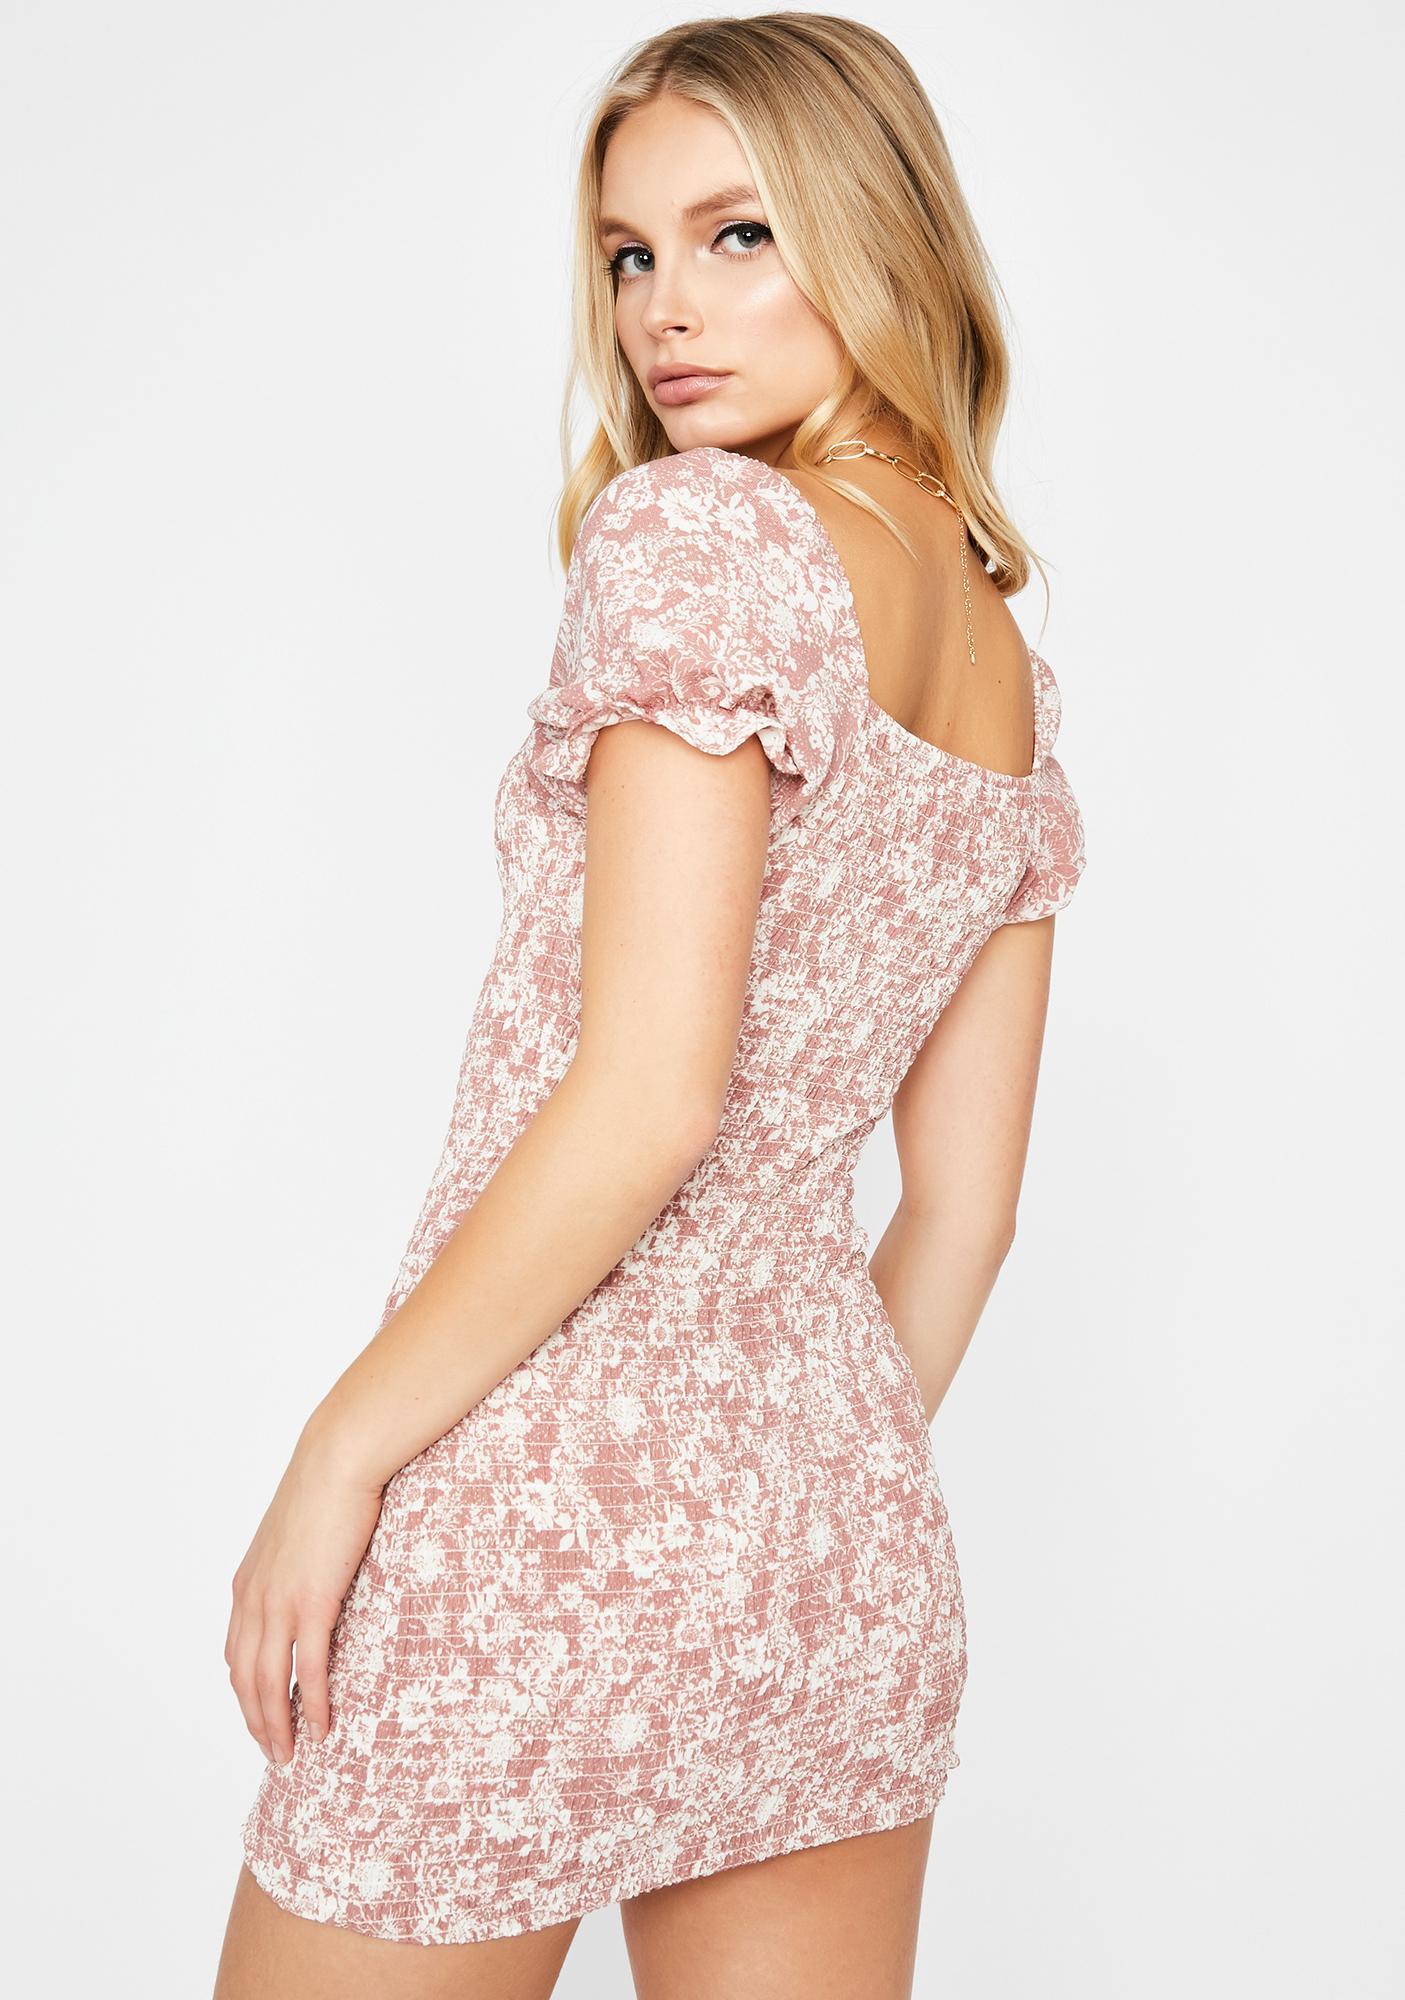 Mauve Grunge Garden Floral Dress